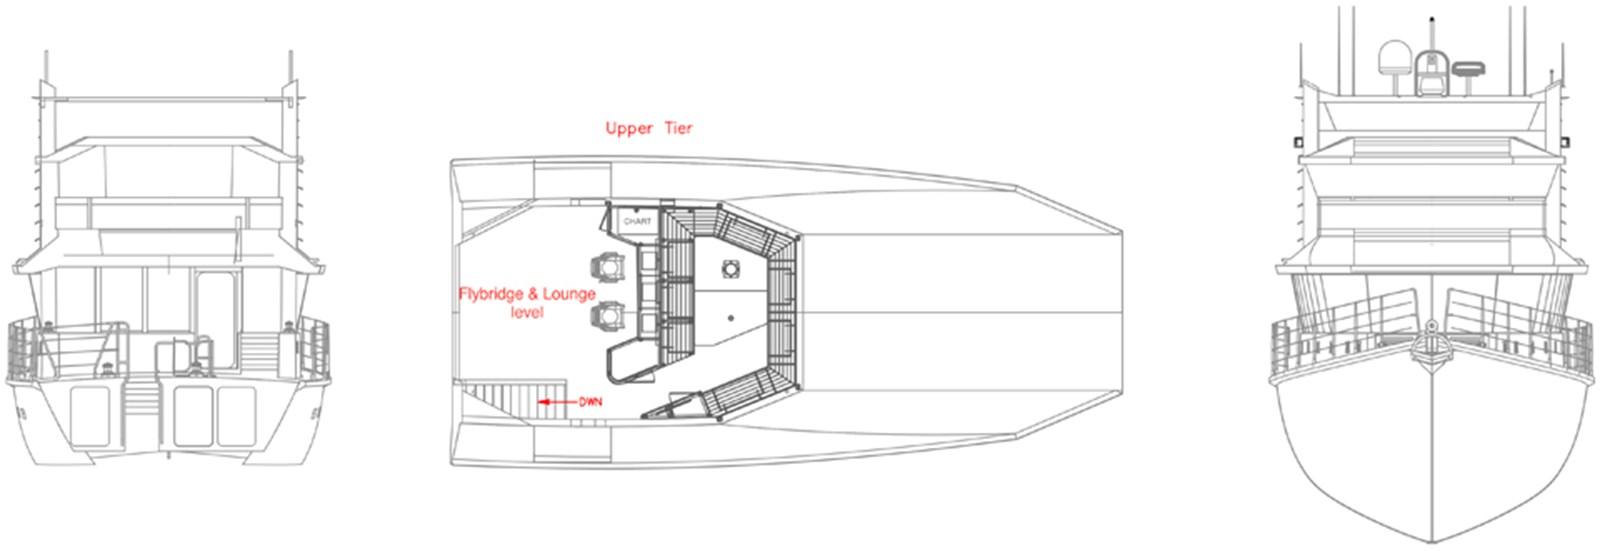 fpb-97-layout-3 2014 CIRCA MARINE FPB 97 Motor Yacht 2788455